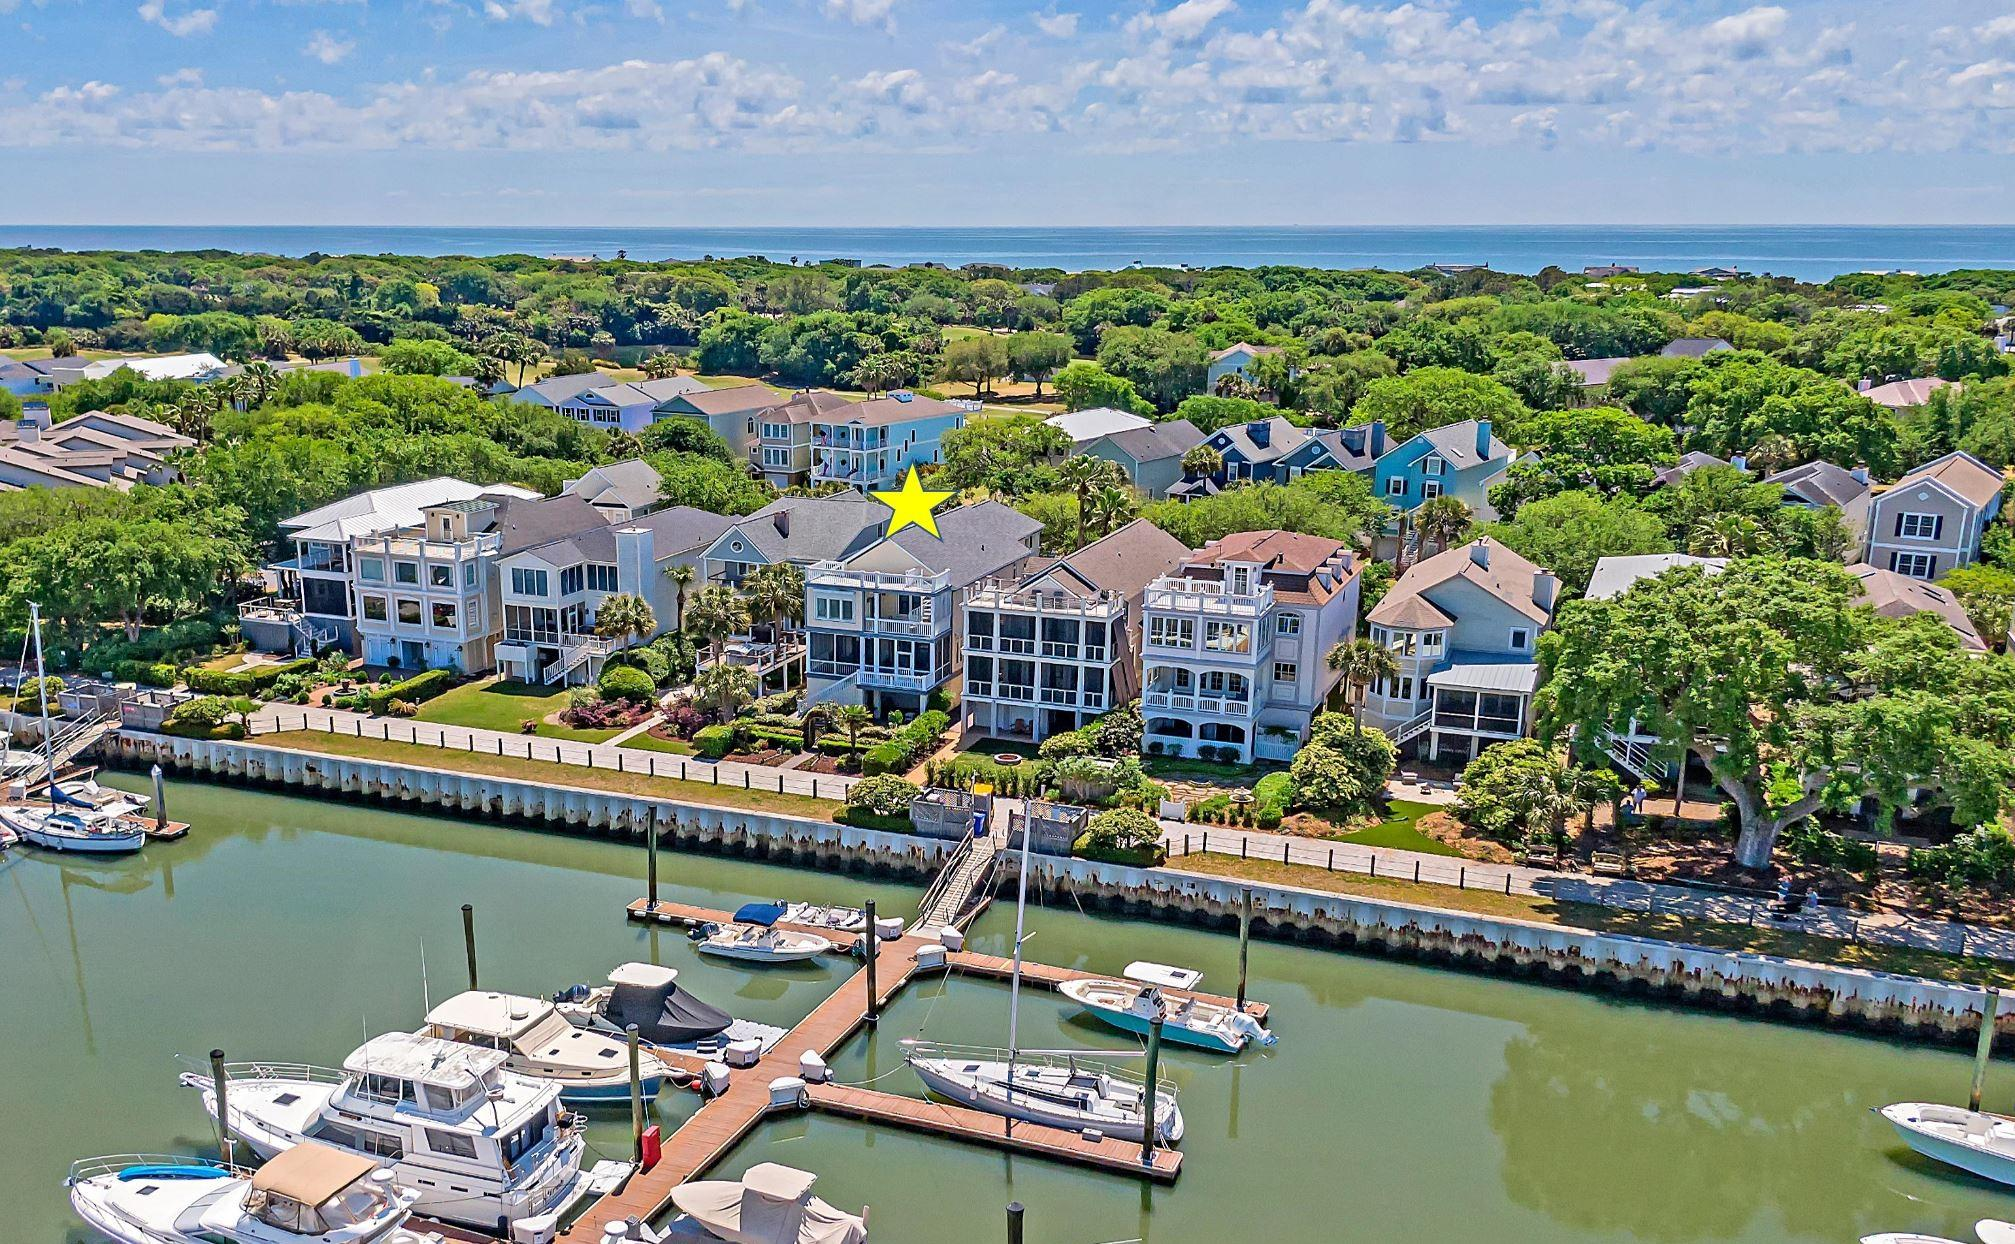 30 Yacht Harbor Court Isle of Palms $1,900,000.00